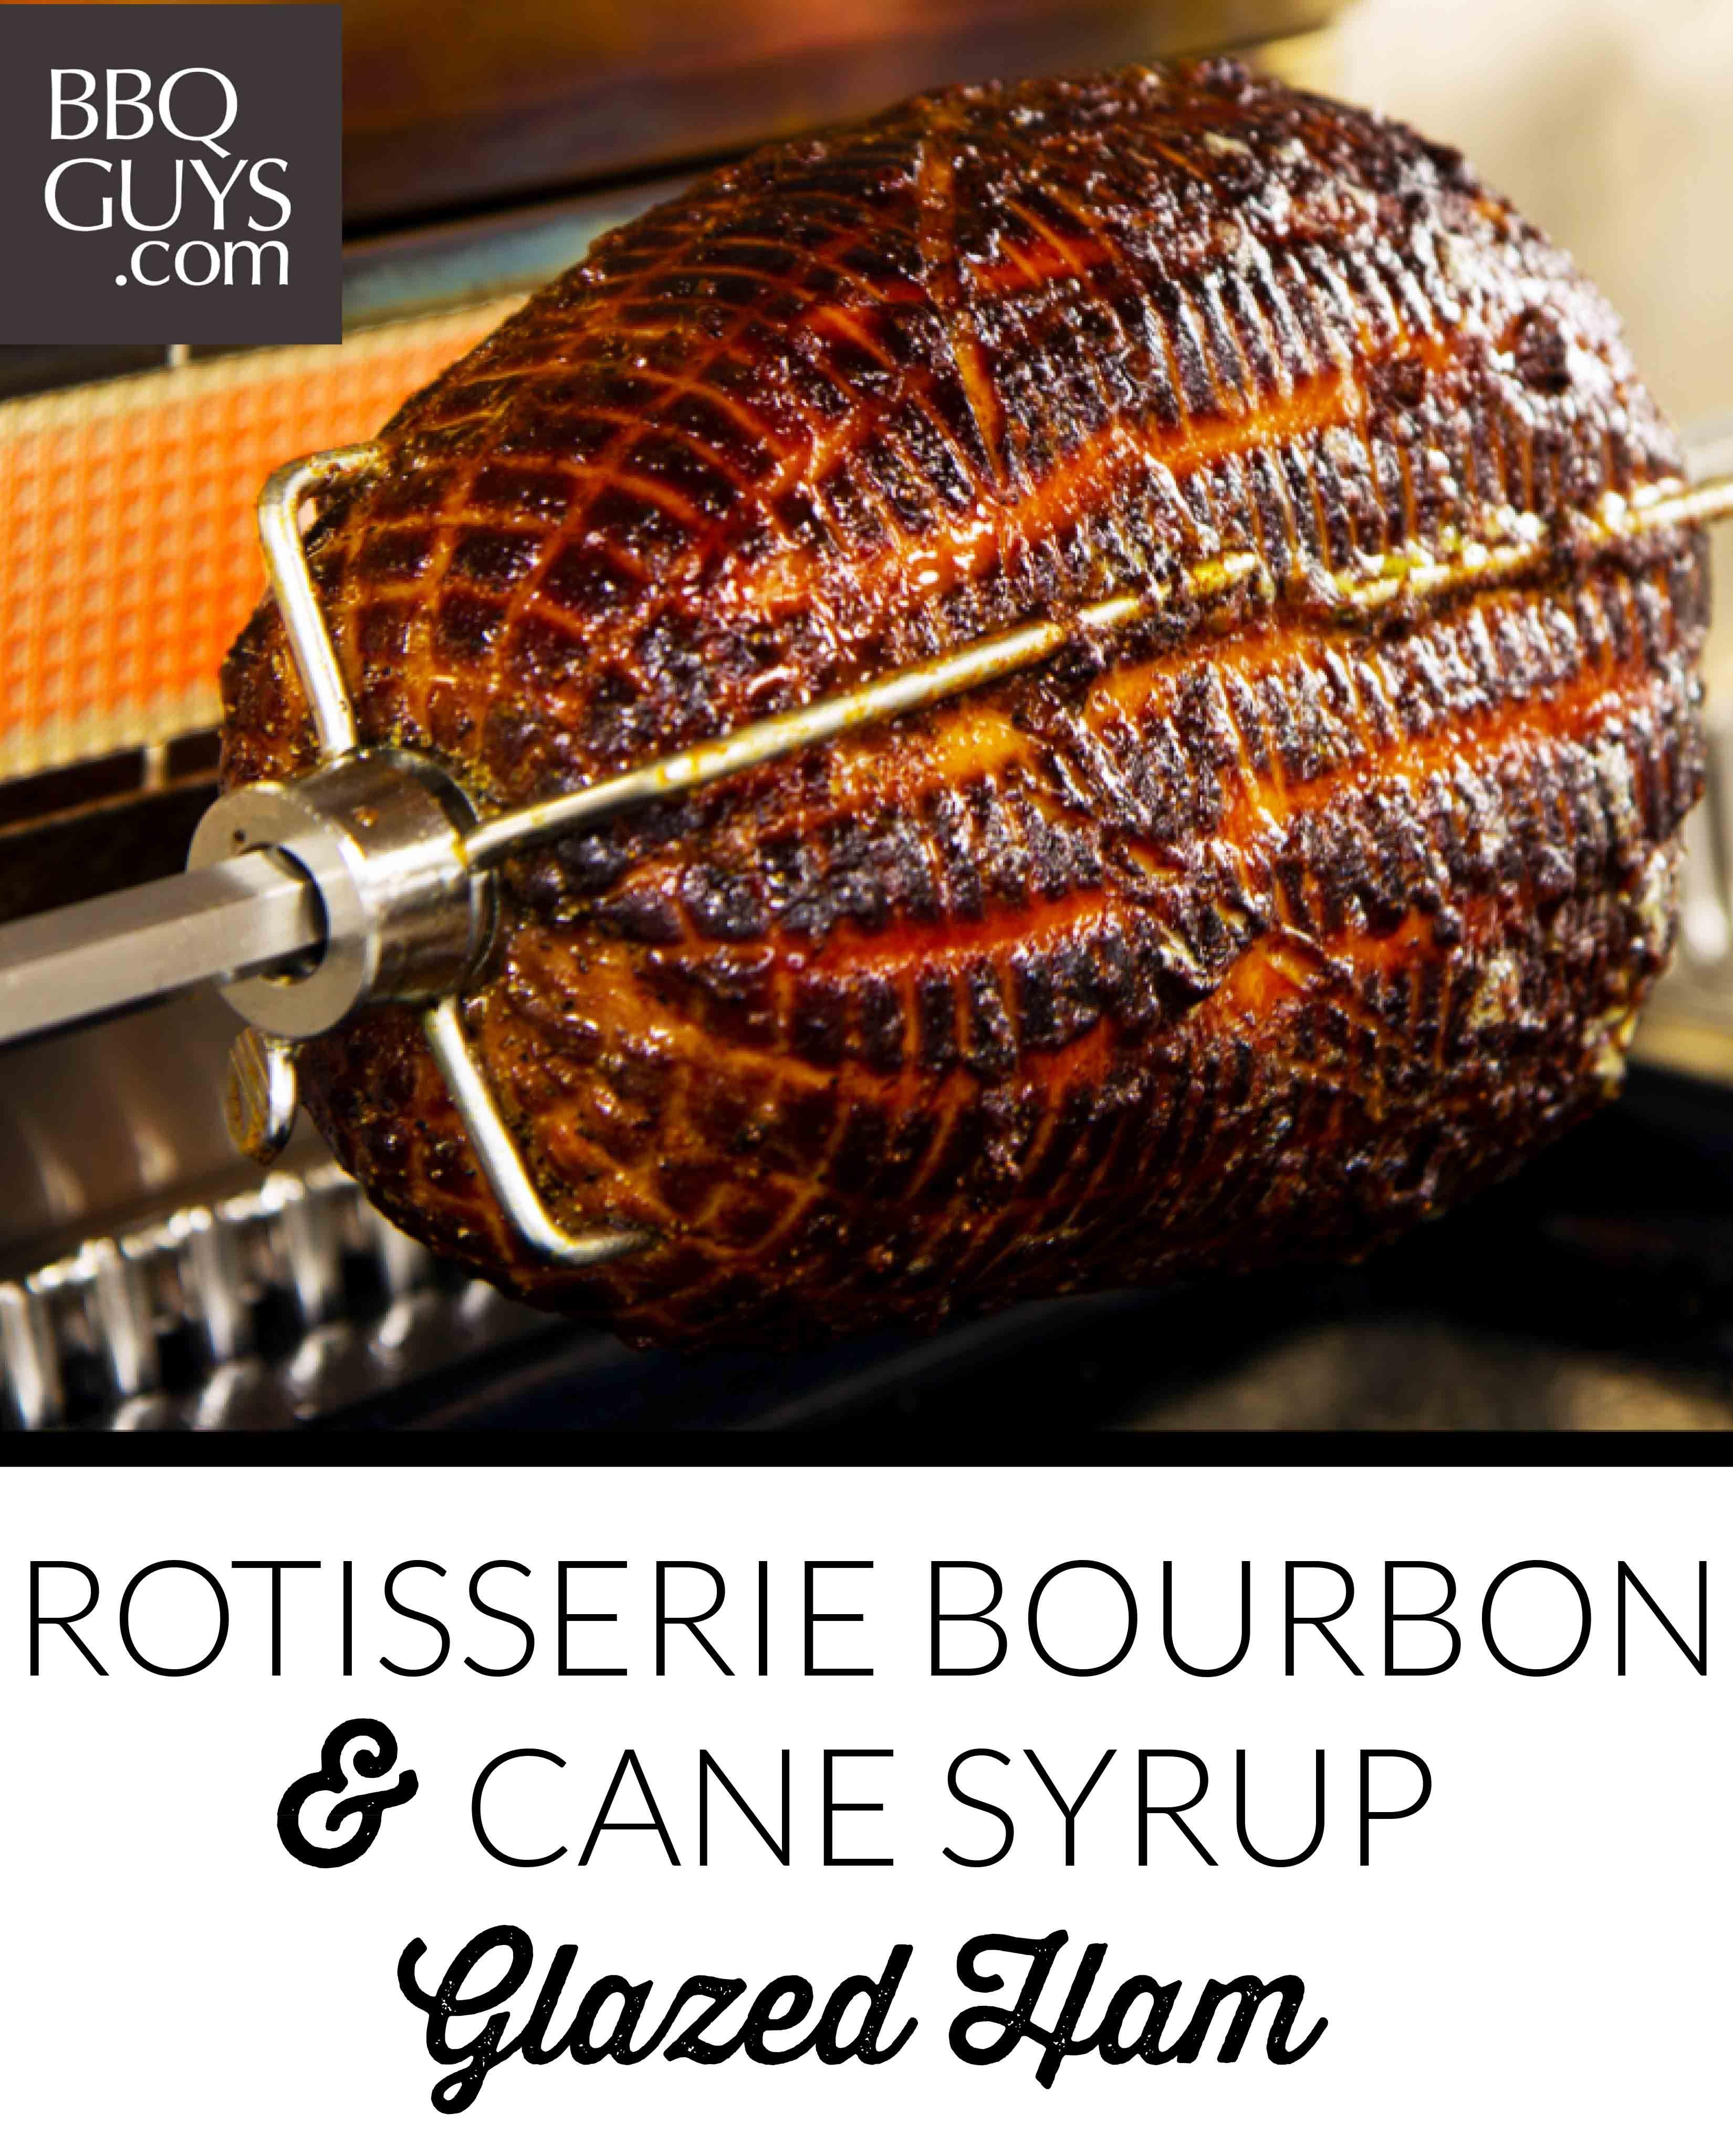 Rotisserie Bourbon Cane Syrup Glazed Ham Recipe On Gas Grill Recipe Video Bbqguys Recipe Rotisserie Ham Glaze Recipe Ham Glaze